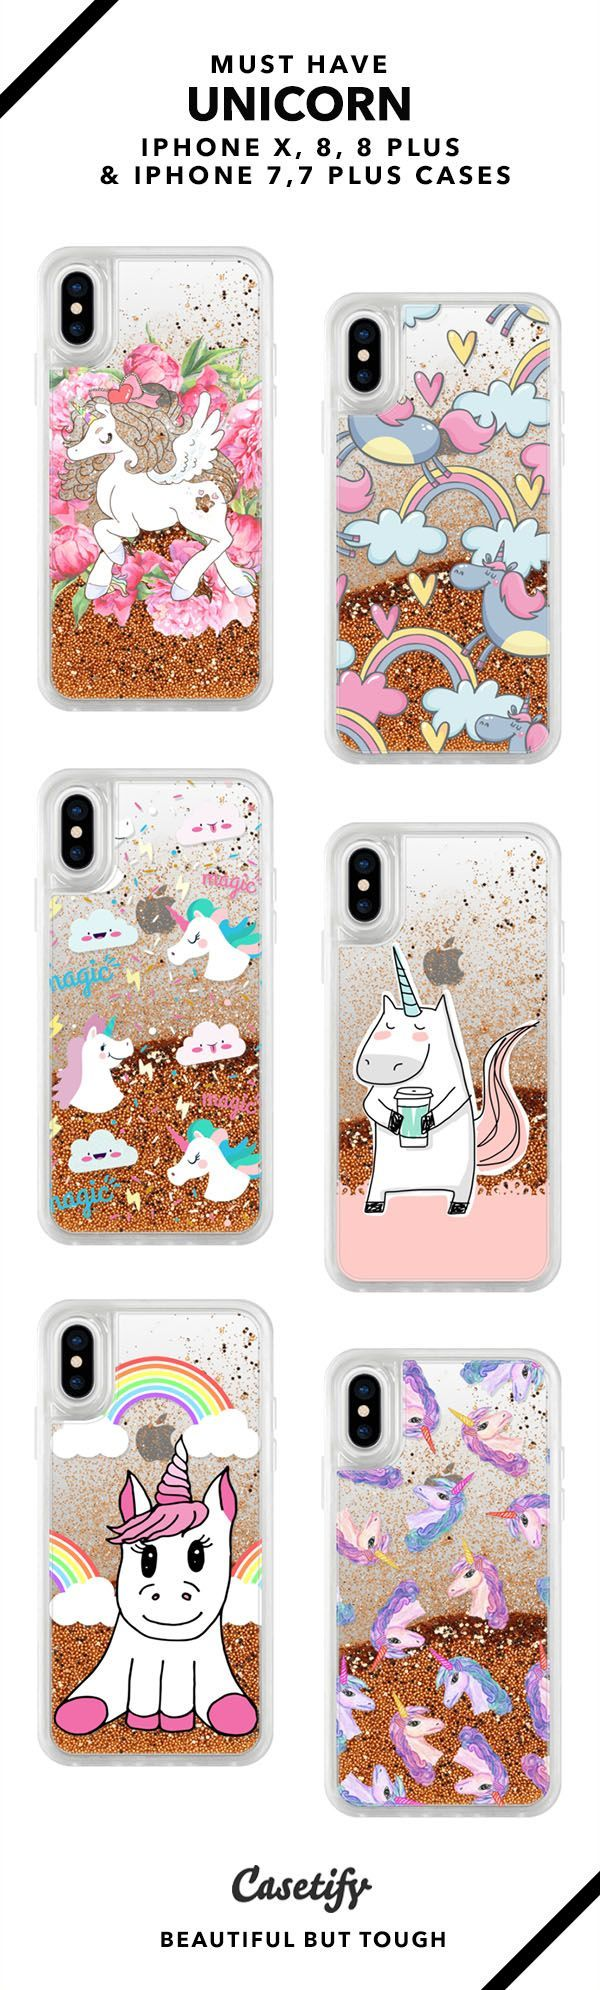 Must Have Unicorn iPhone X, iPhone 8, iPhone 8 Plus, iPhone 7 and iPhone 7 Plus case. - Shop them here ☝️☝️☝️ BEAUTIFUL BUT TOUGH ✨ - unicorns, dreamy, unicorn art, unicorn customs #iphone8pluscase,